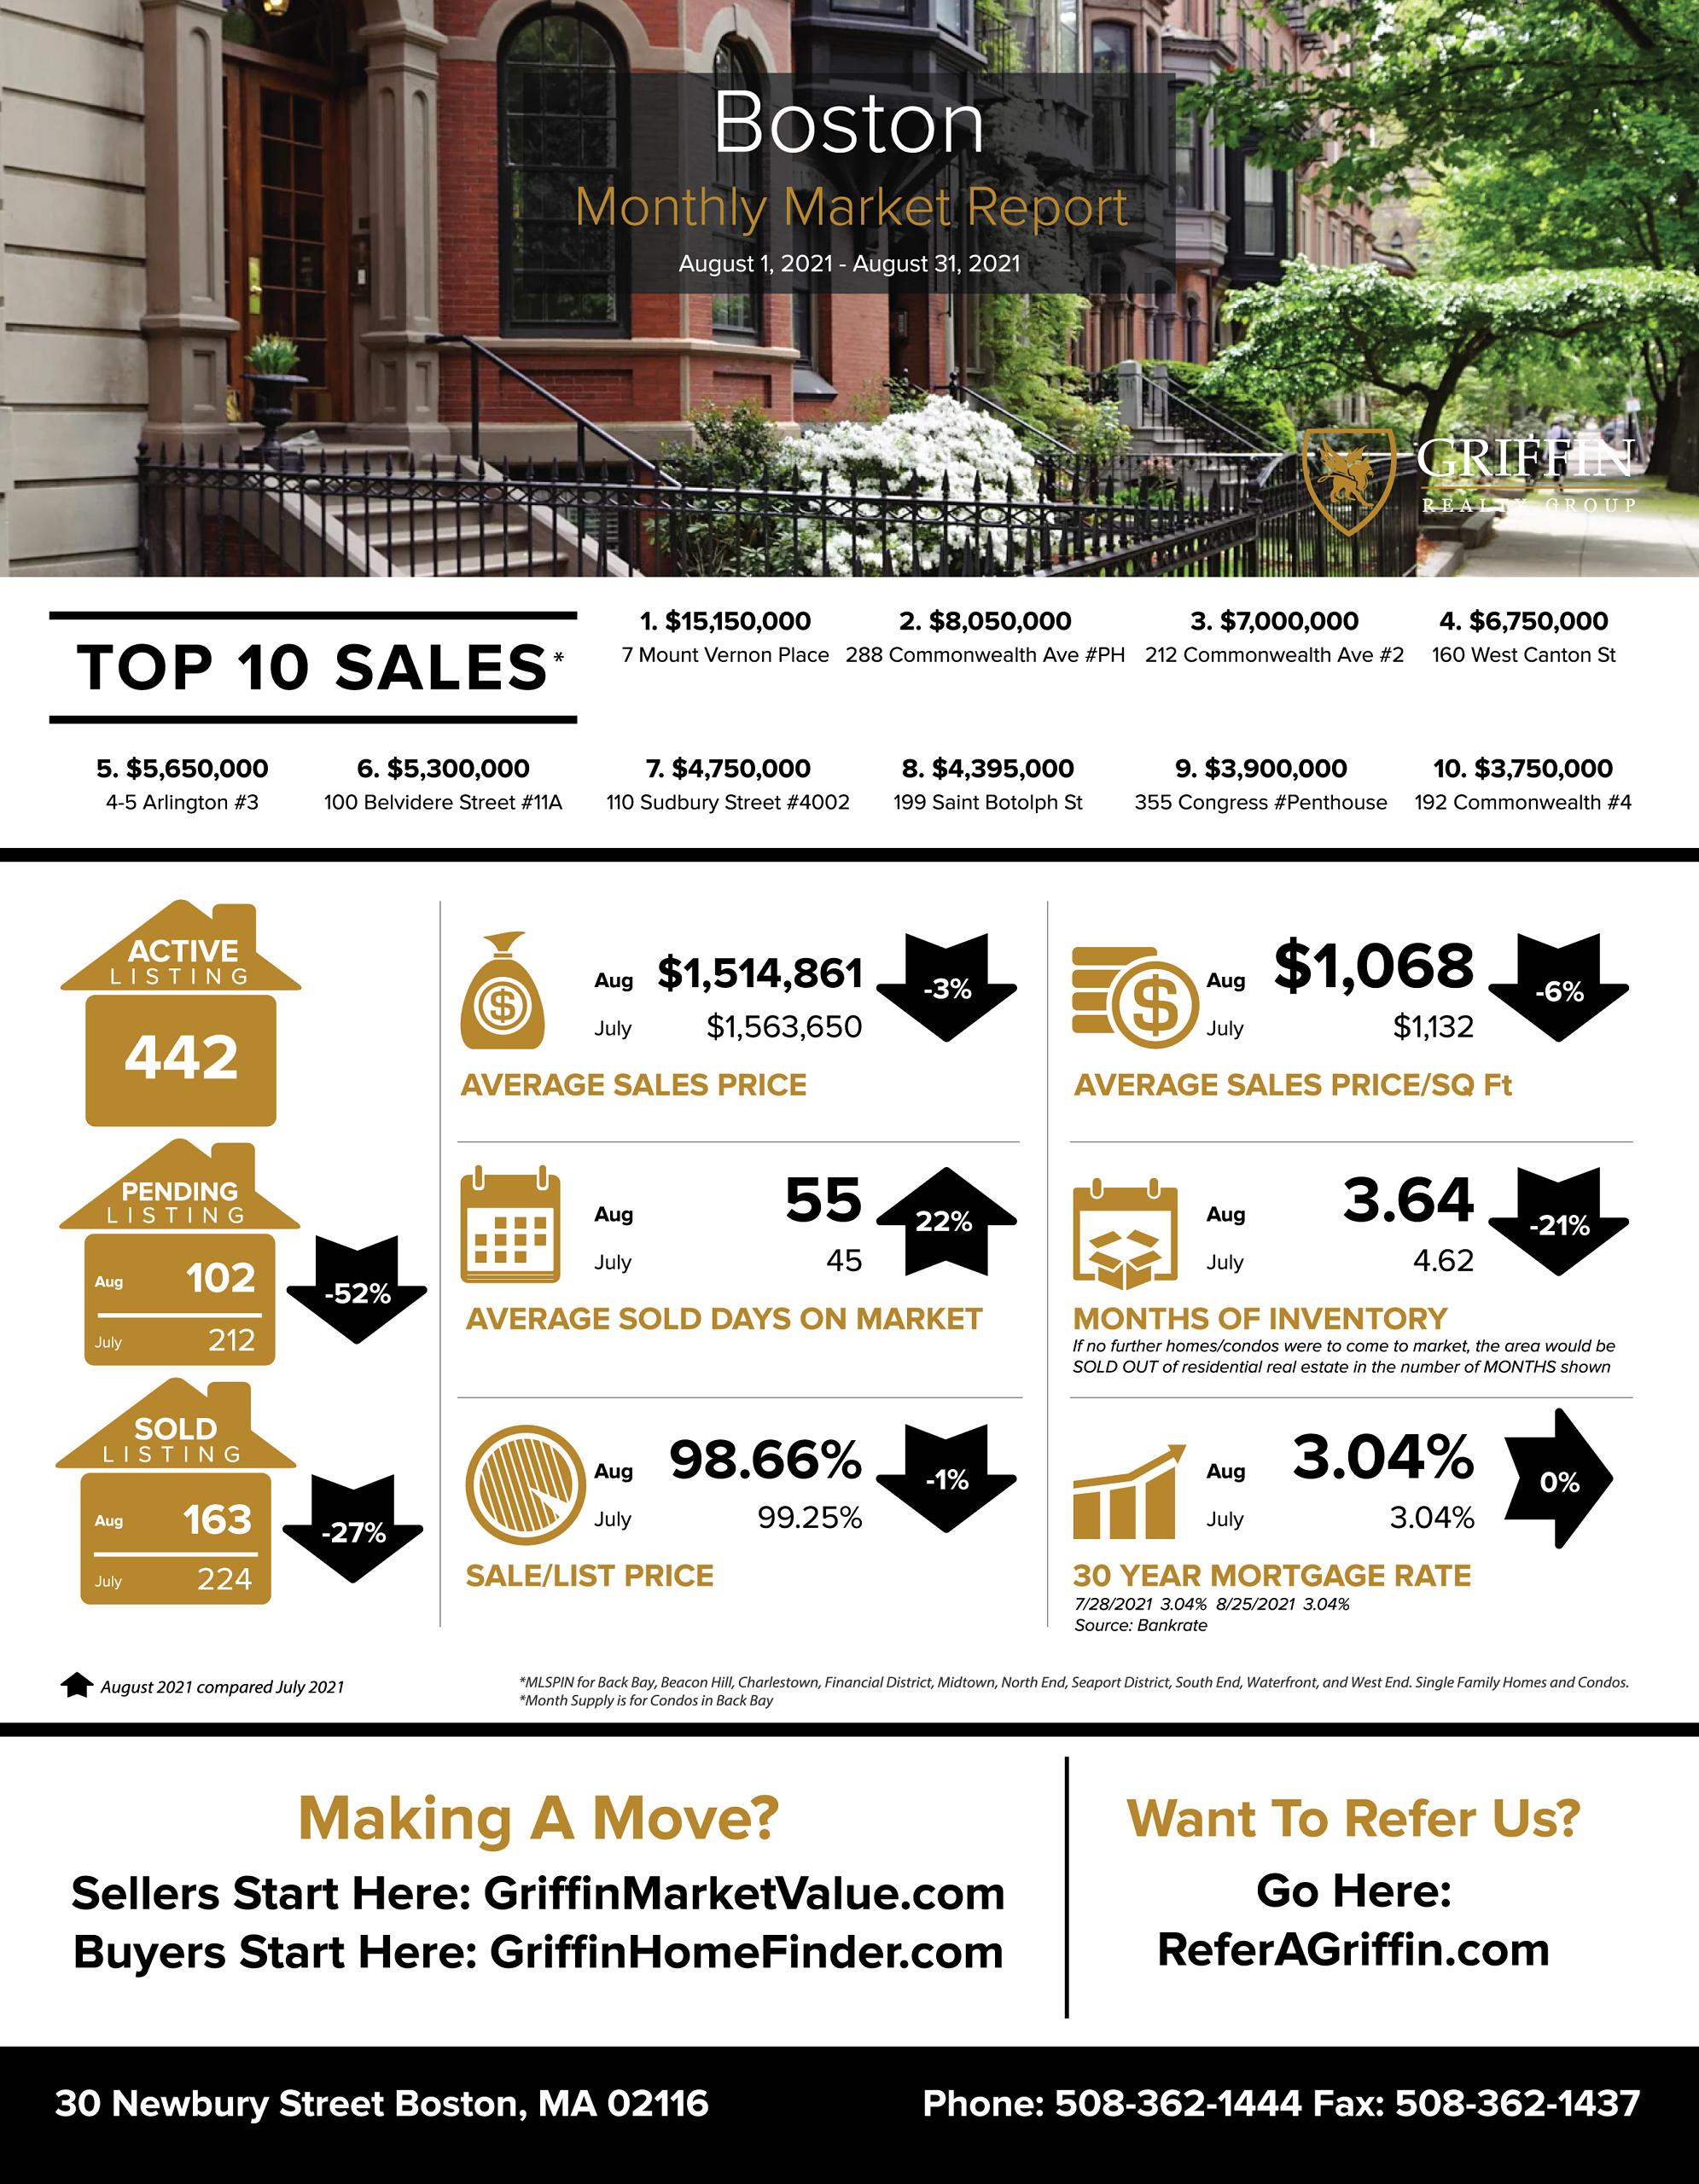 Real Estate Market Update | Boston | August 2021 Vs July 2021